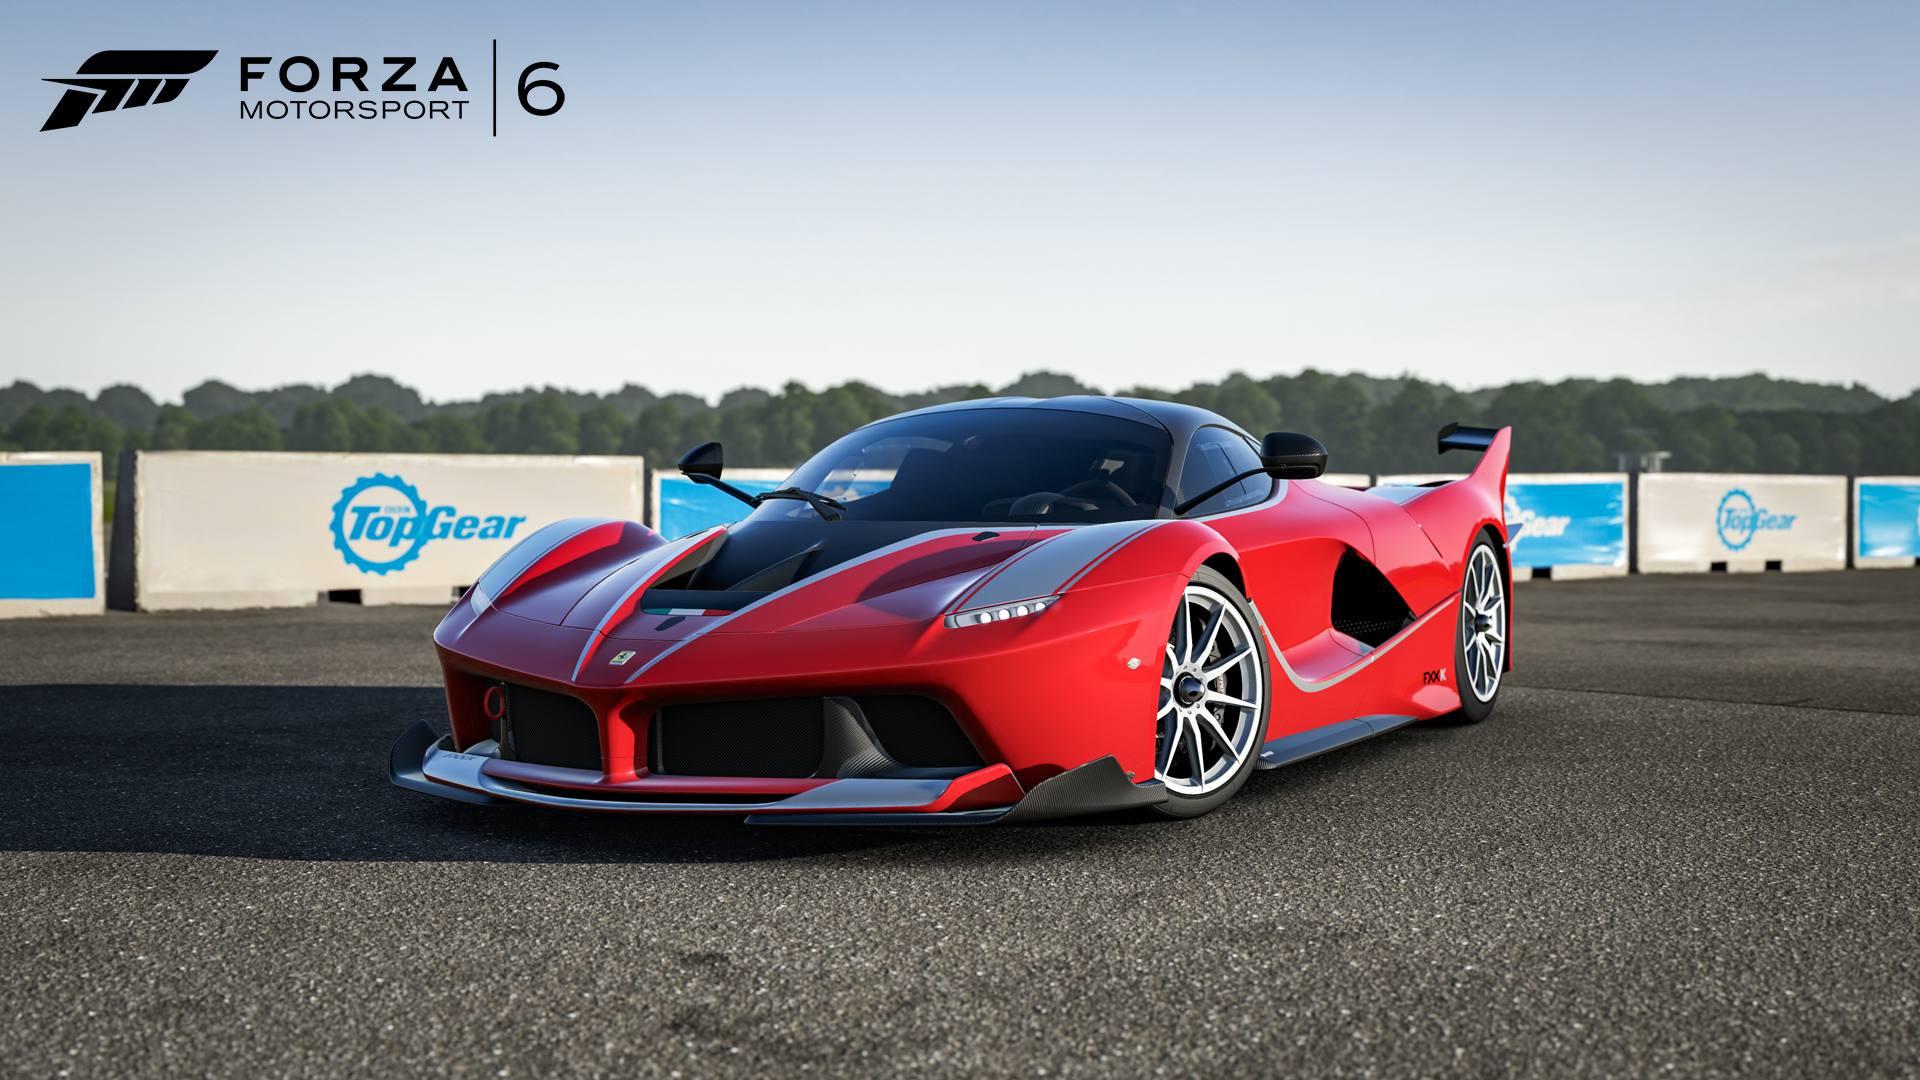 Forza Motorsport 6 2014 Ferrari FXX K 05-04-16 001